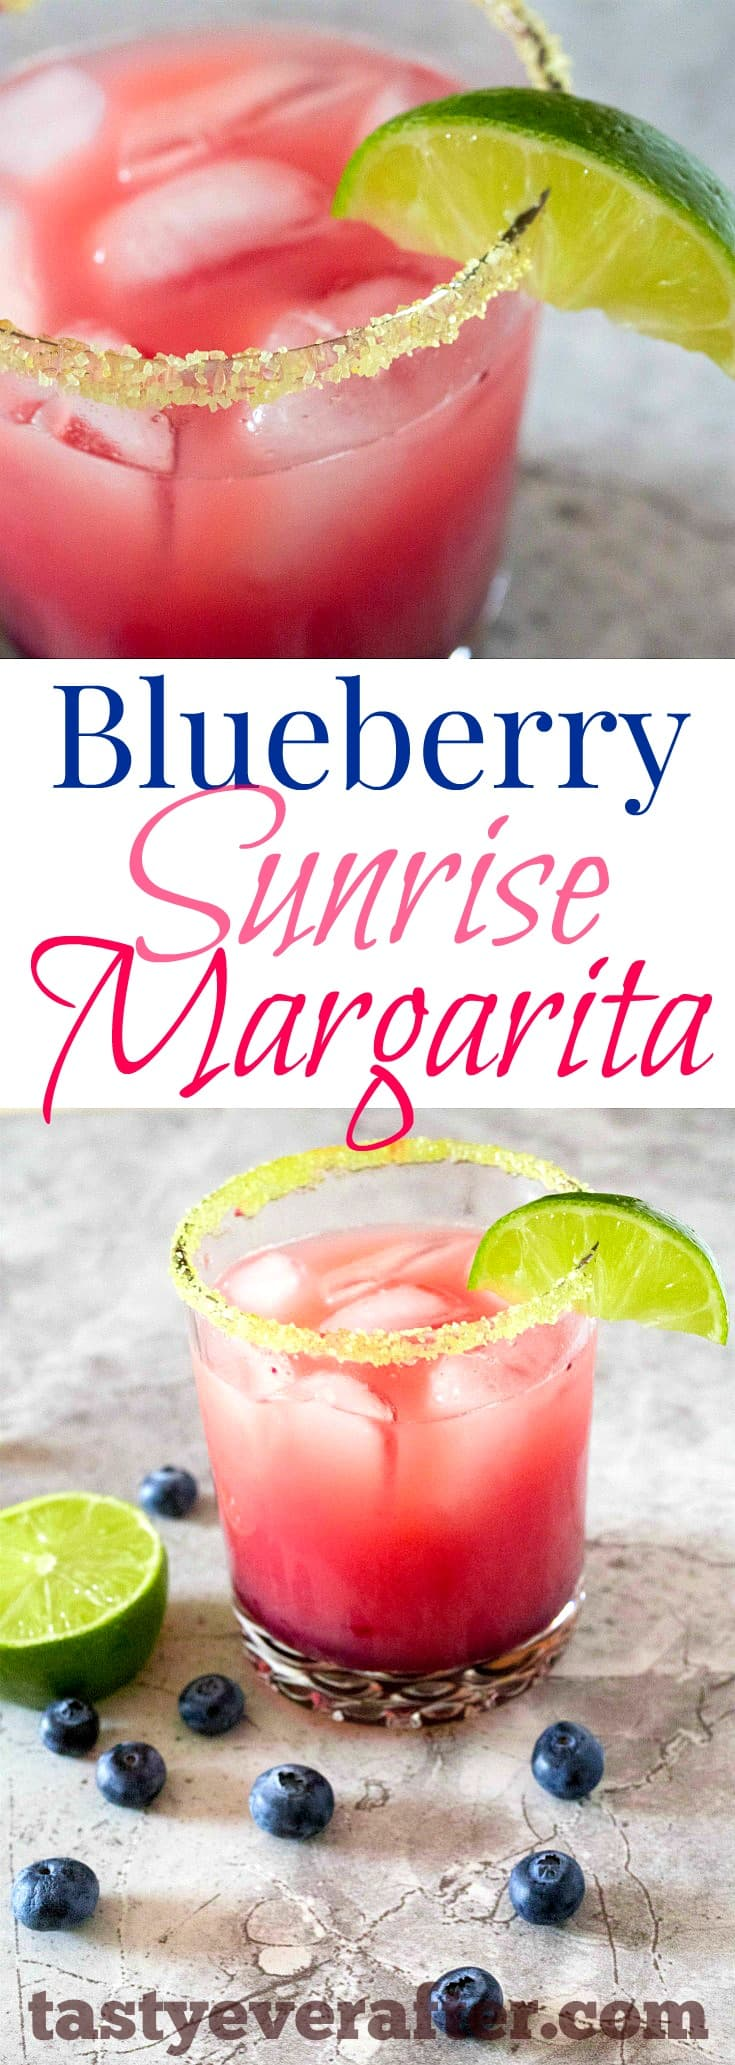 Blueberry Sunrise Margarita Recipe